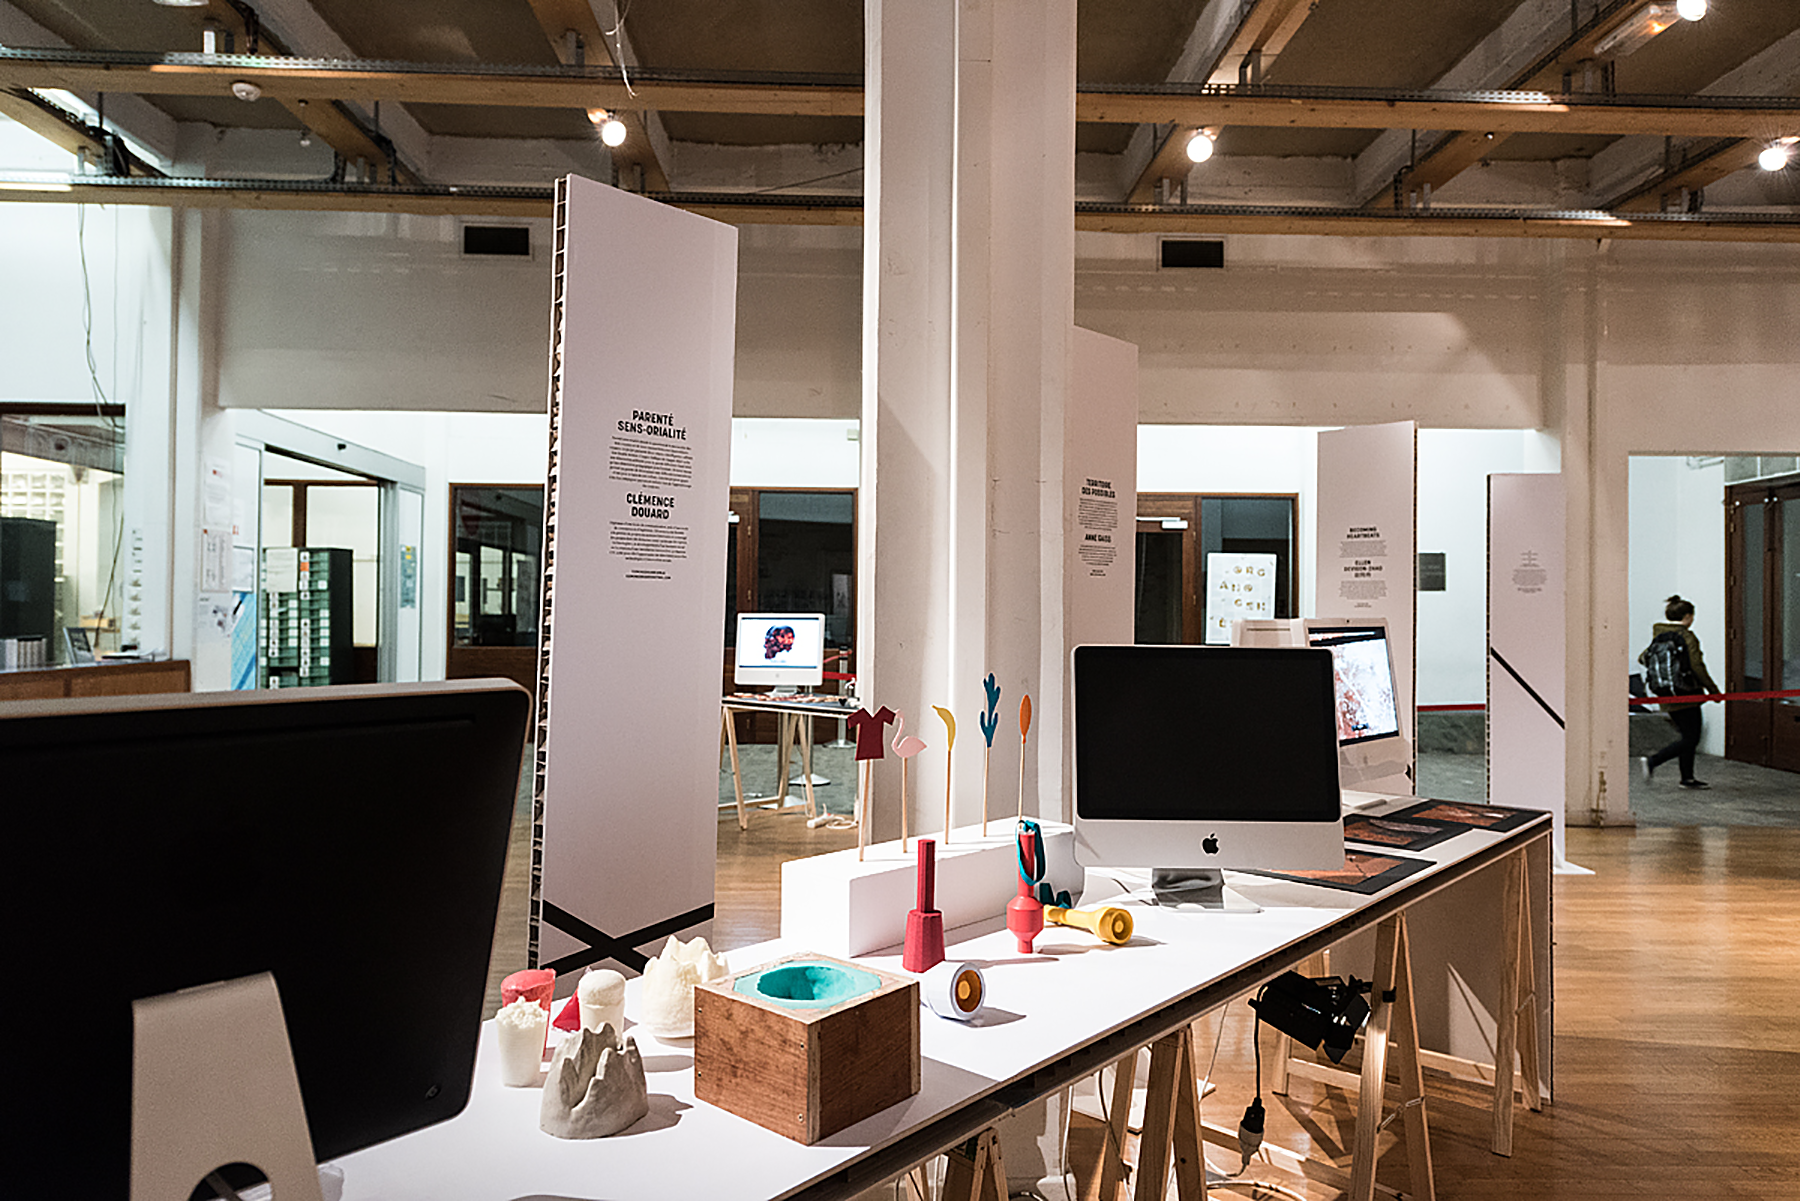 Exhibition scenography